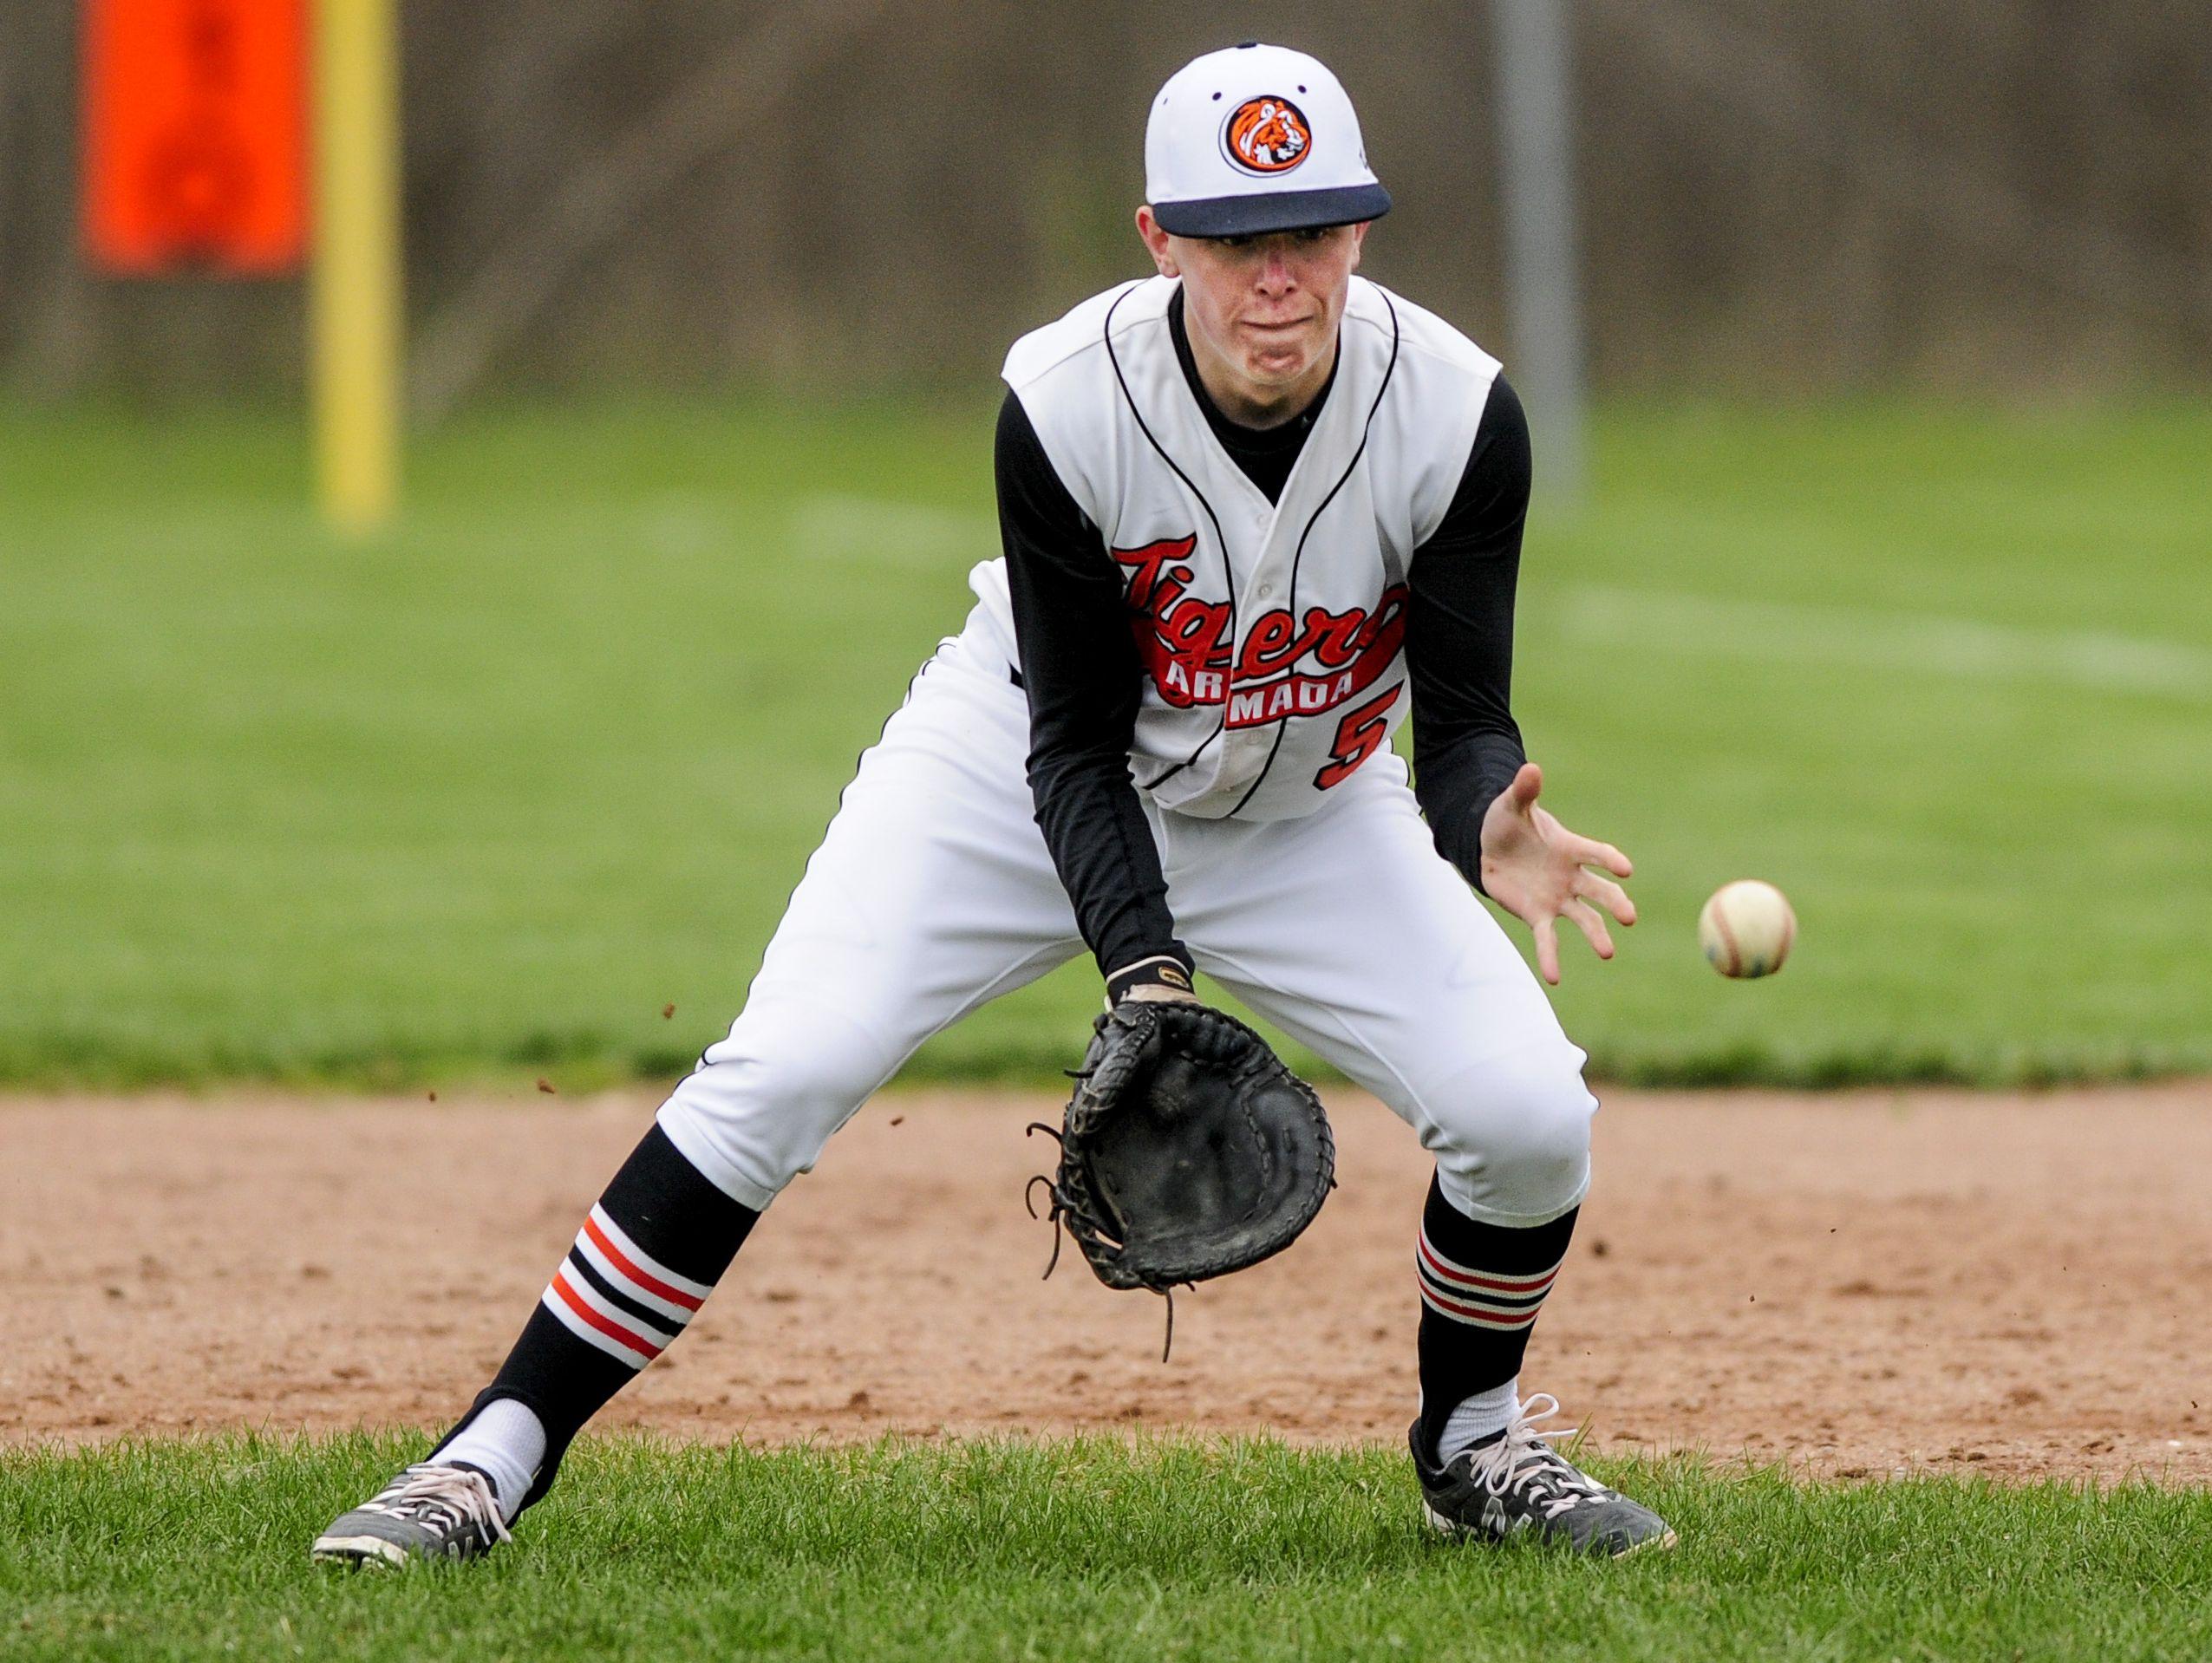 Armada's Mitch Ruczynski fields the ball during a baseball game Thursday, April 28, 2016 at Armada High School.